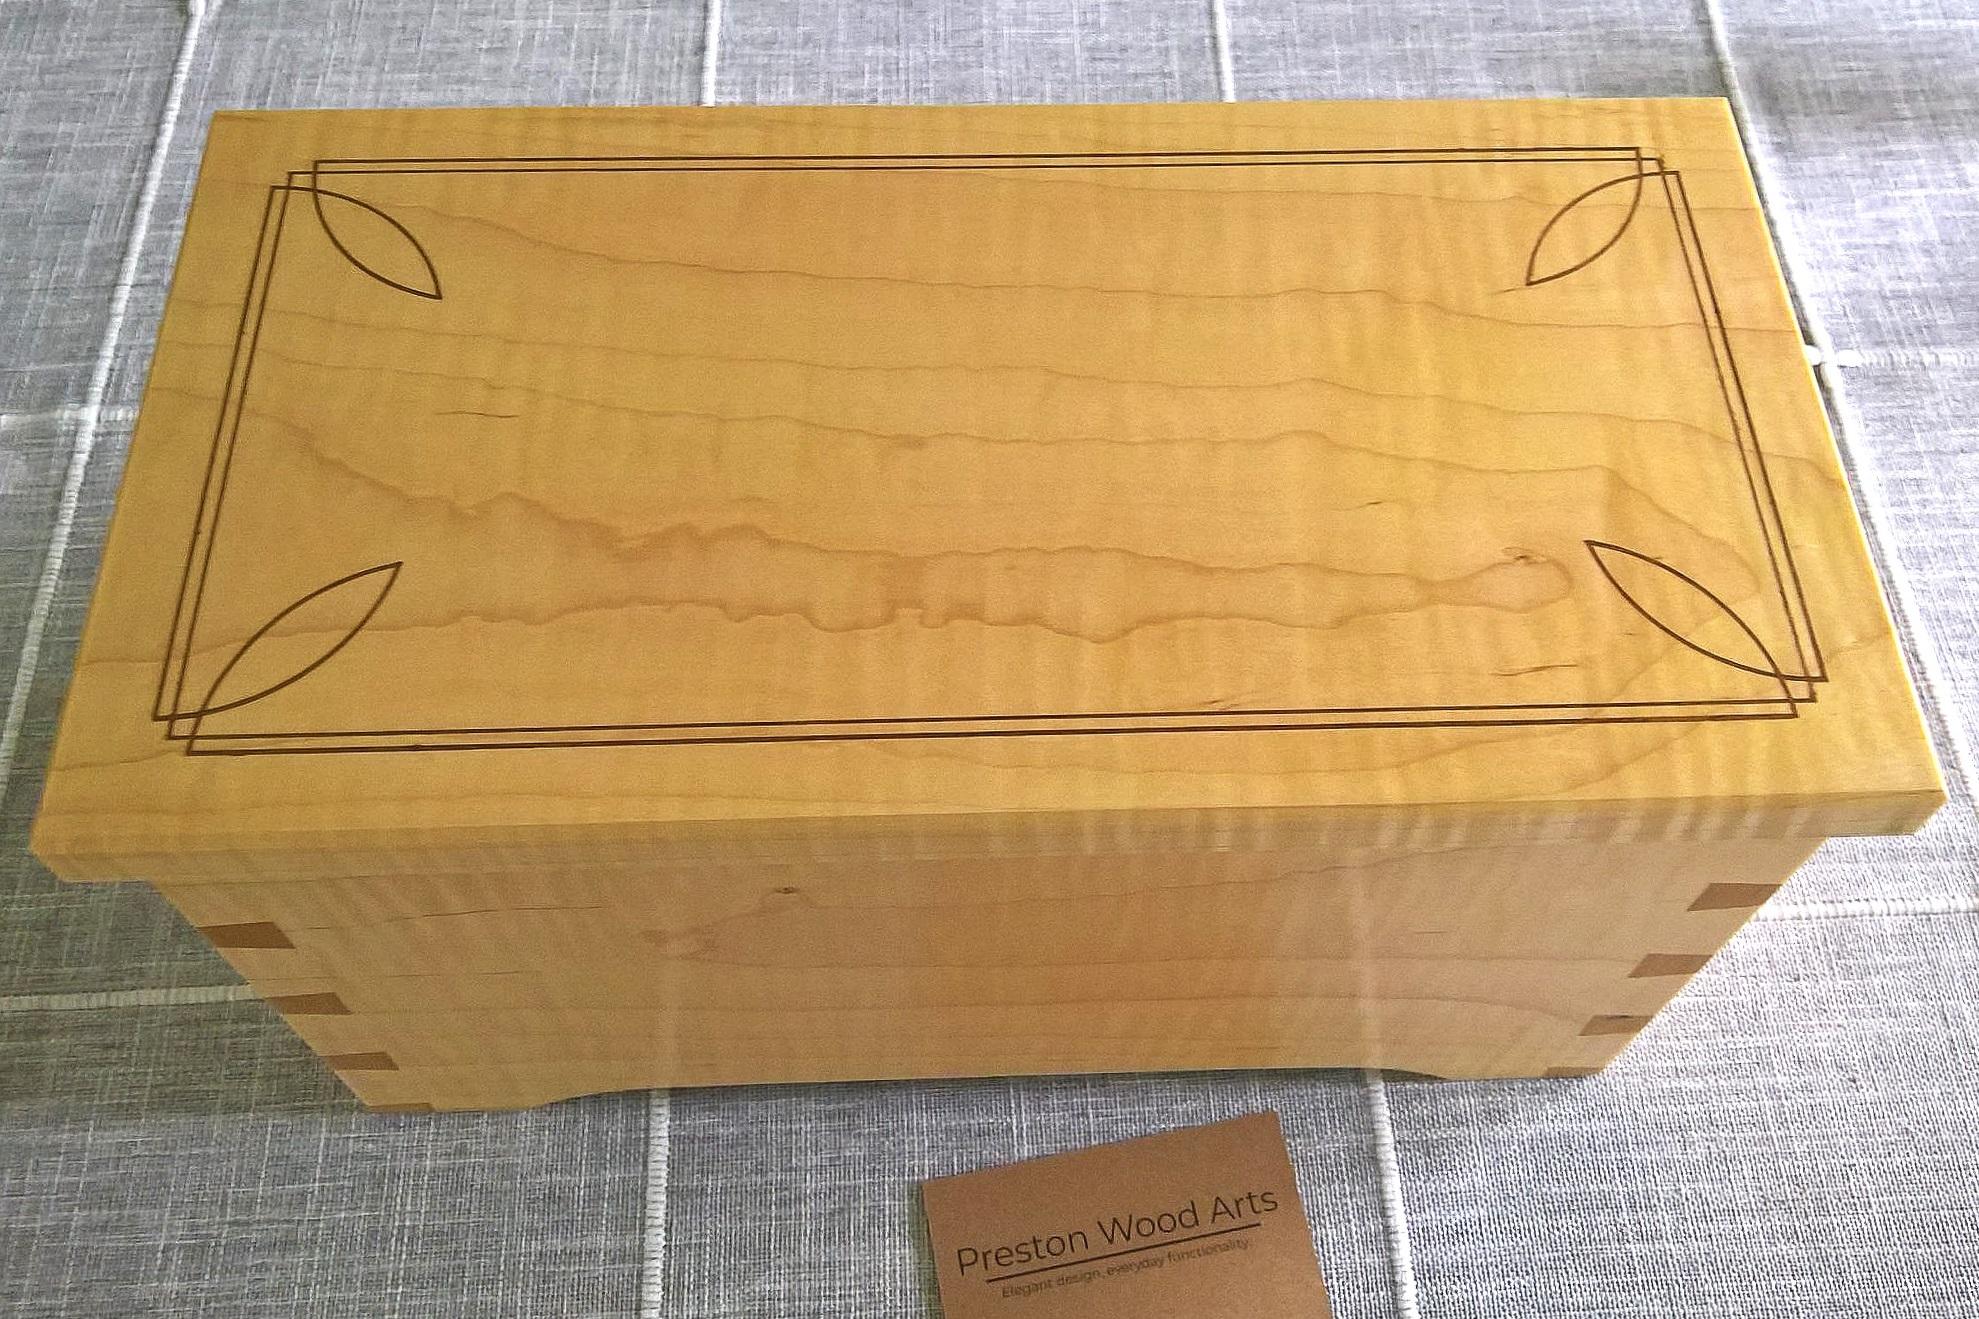 Dovetailed Keepsake Box - Figured Maple with Walnut Inlay